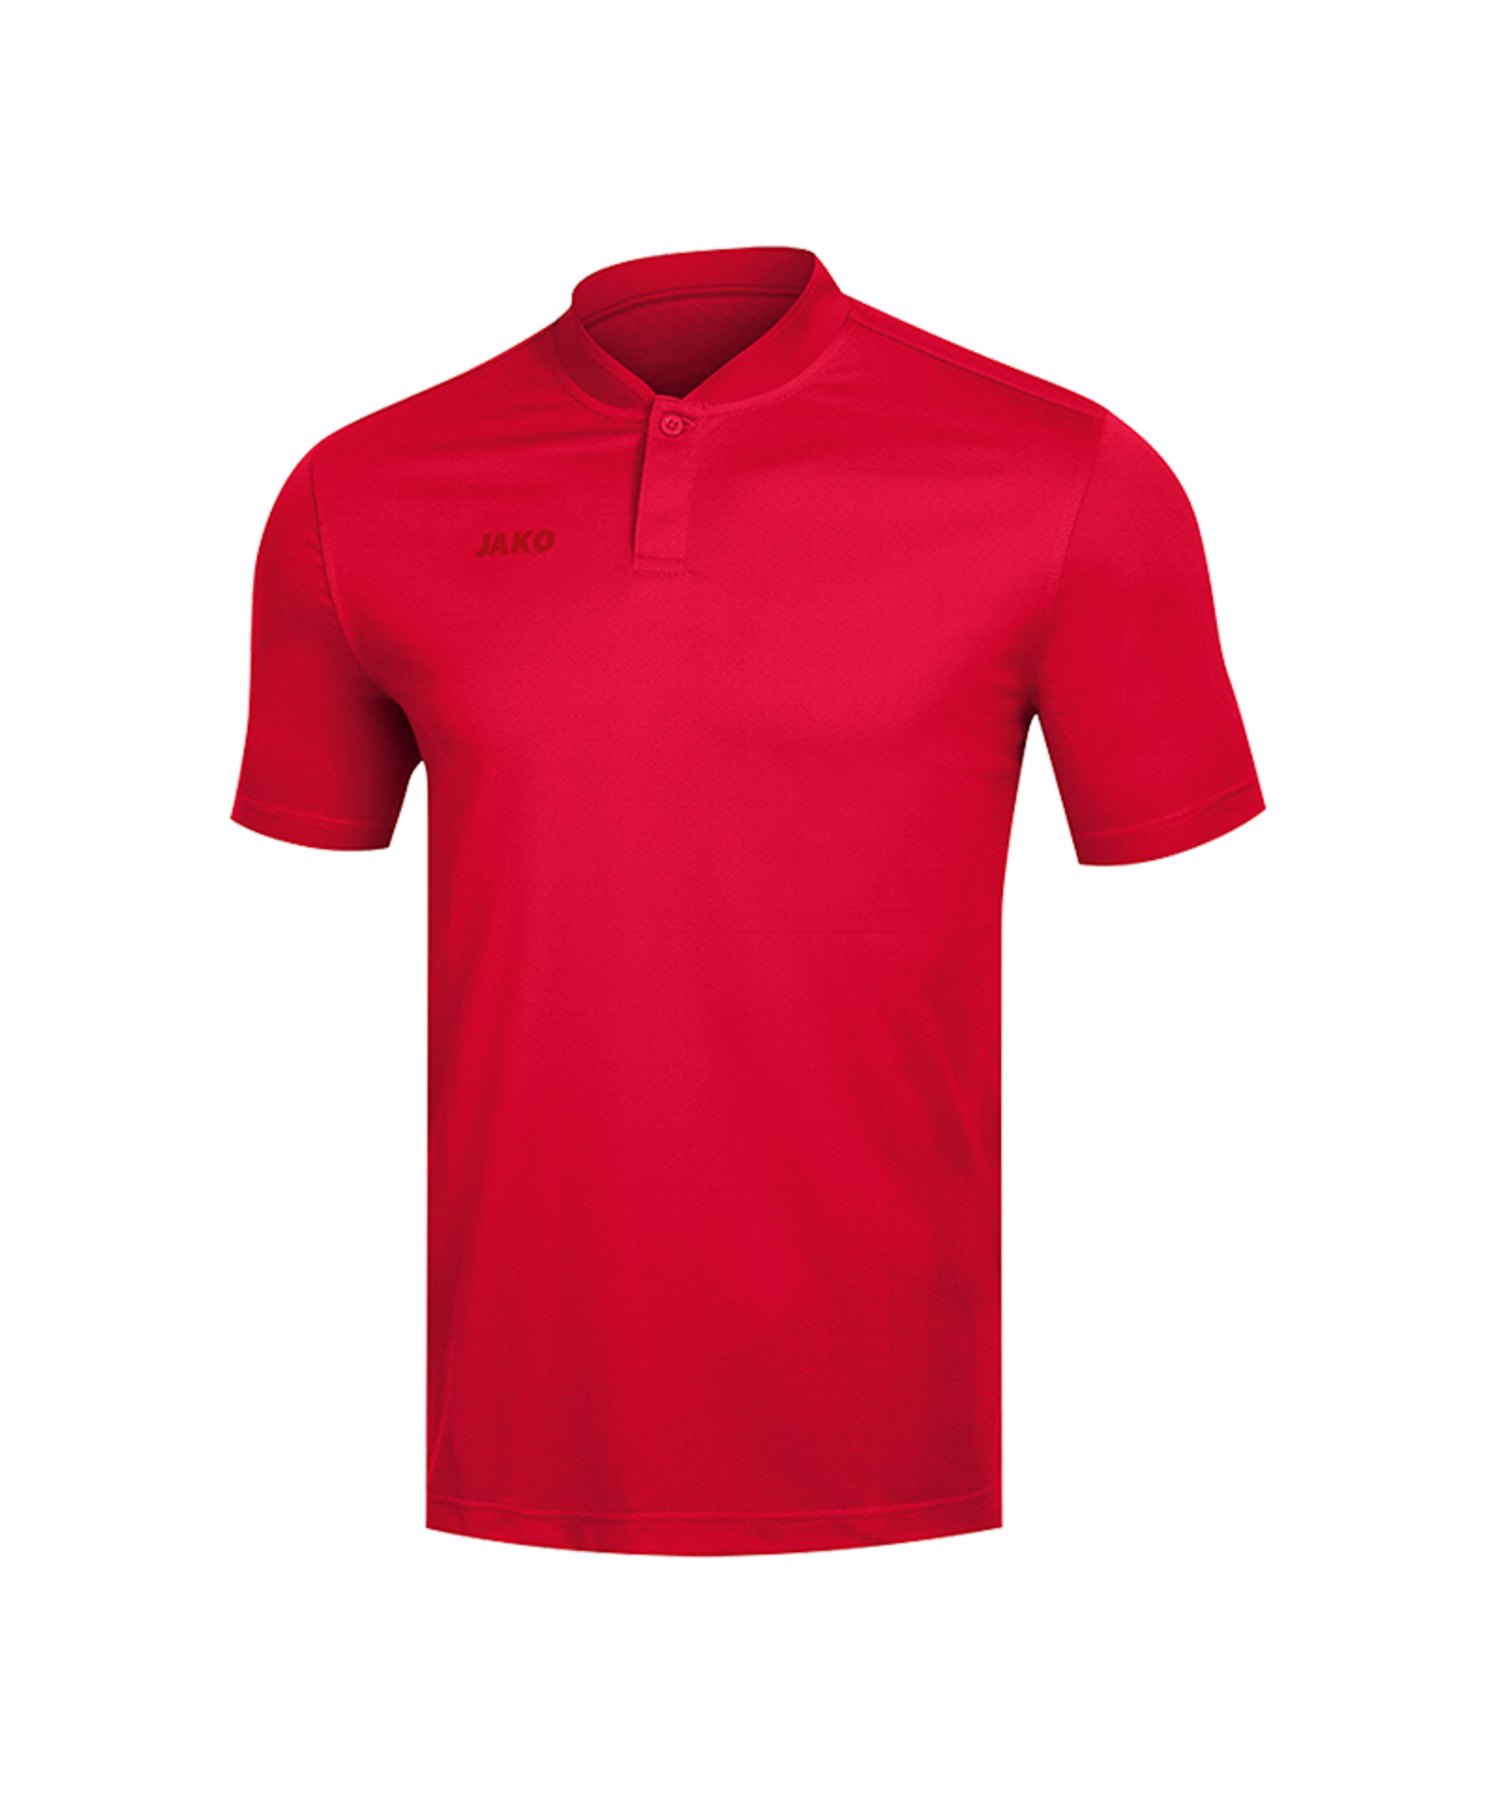 Jako Prestige Poloshirt Damen Rot F01 - Rot